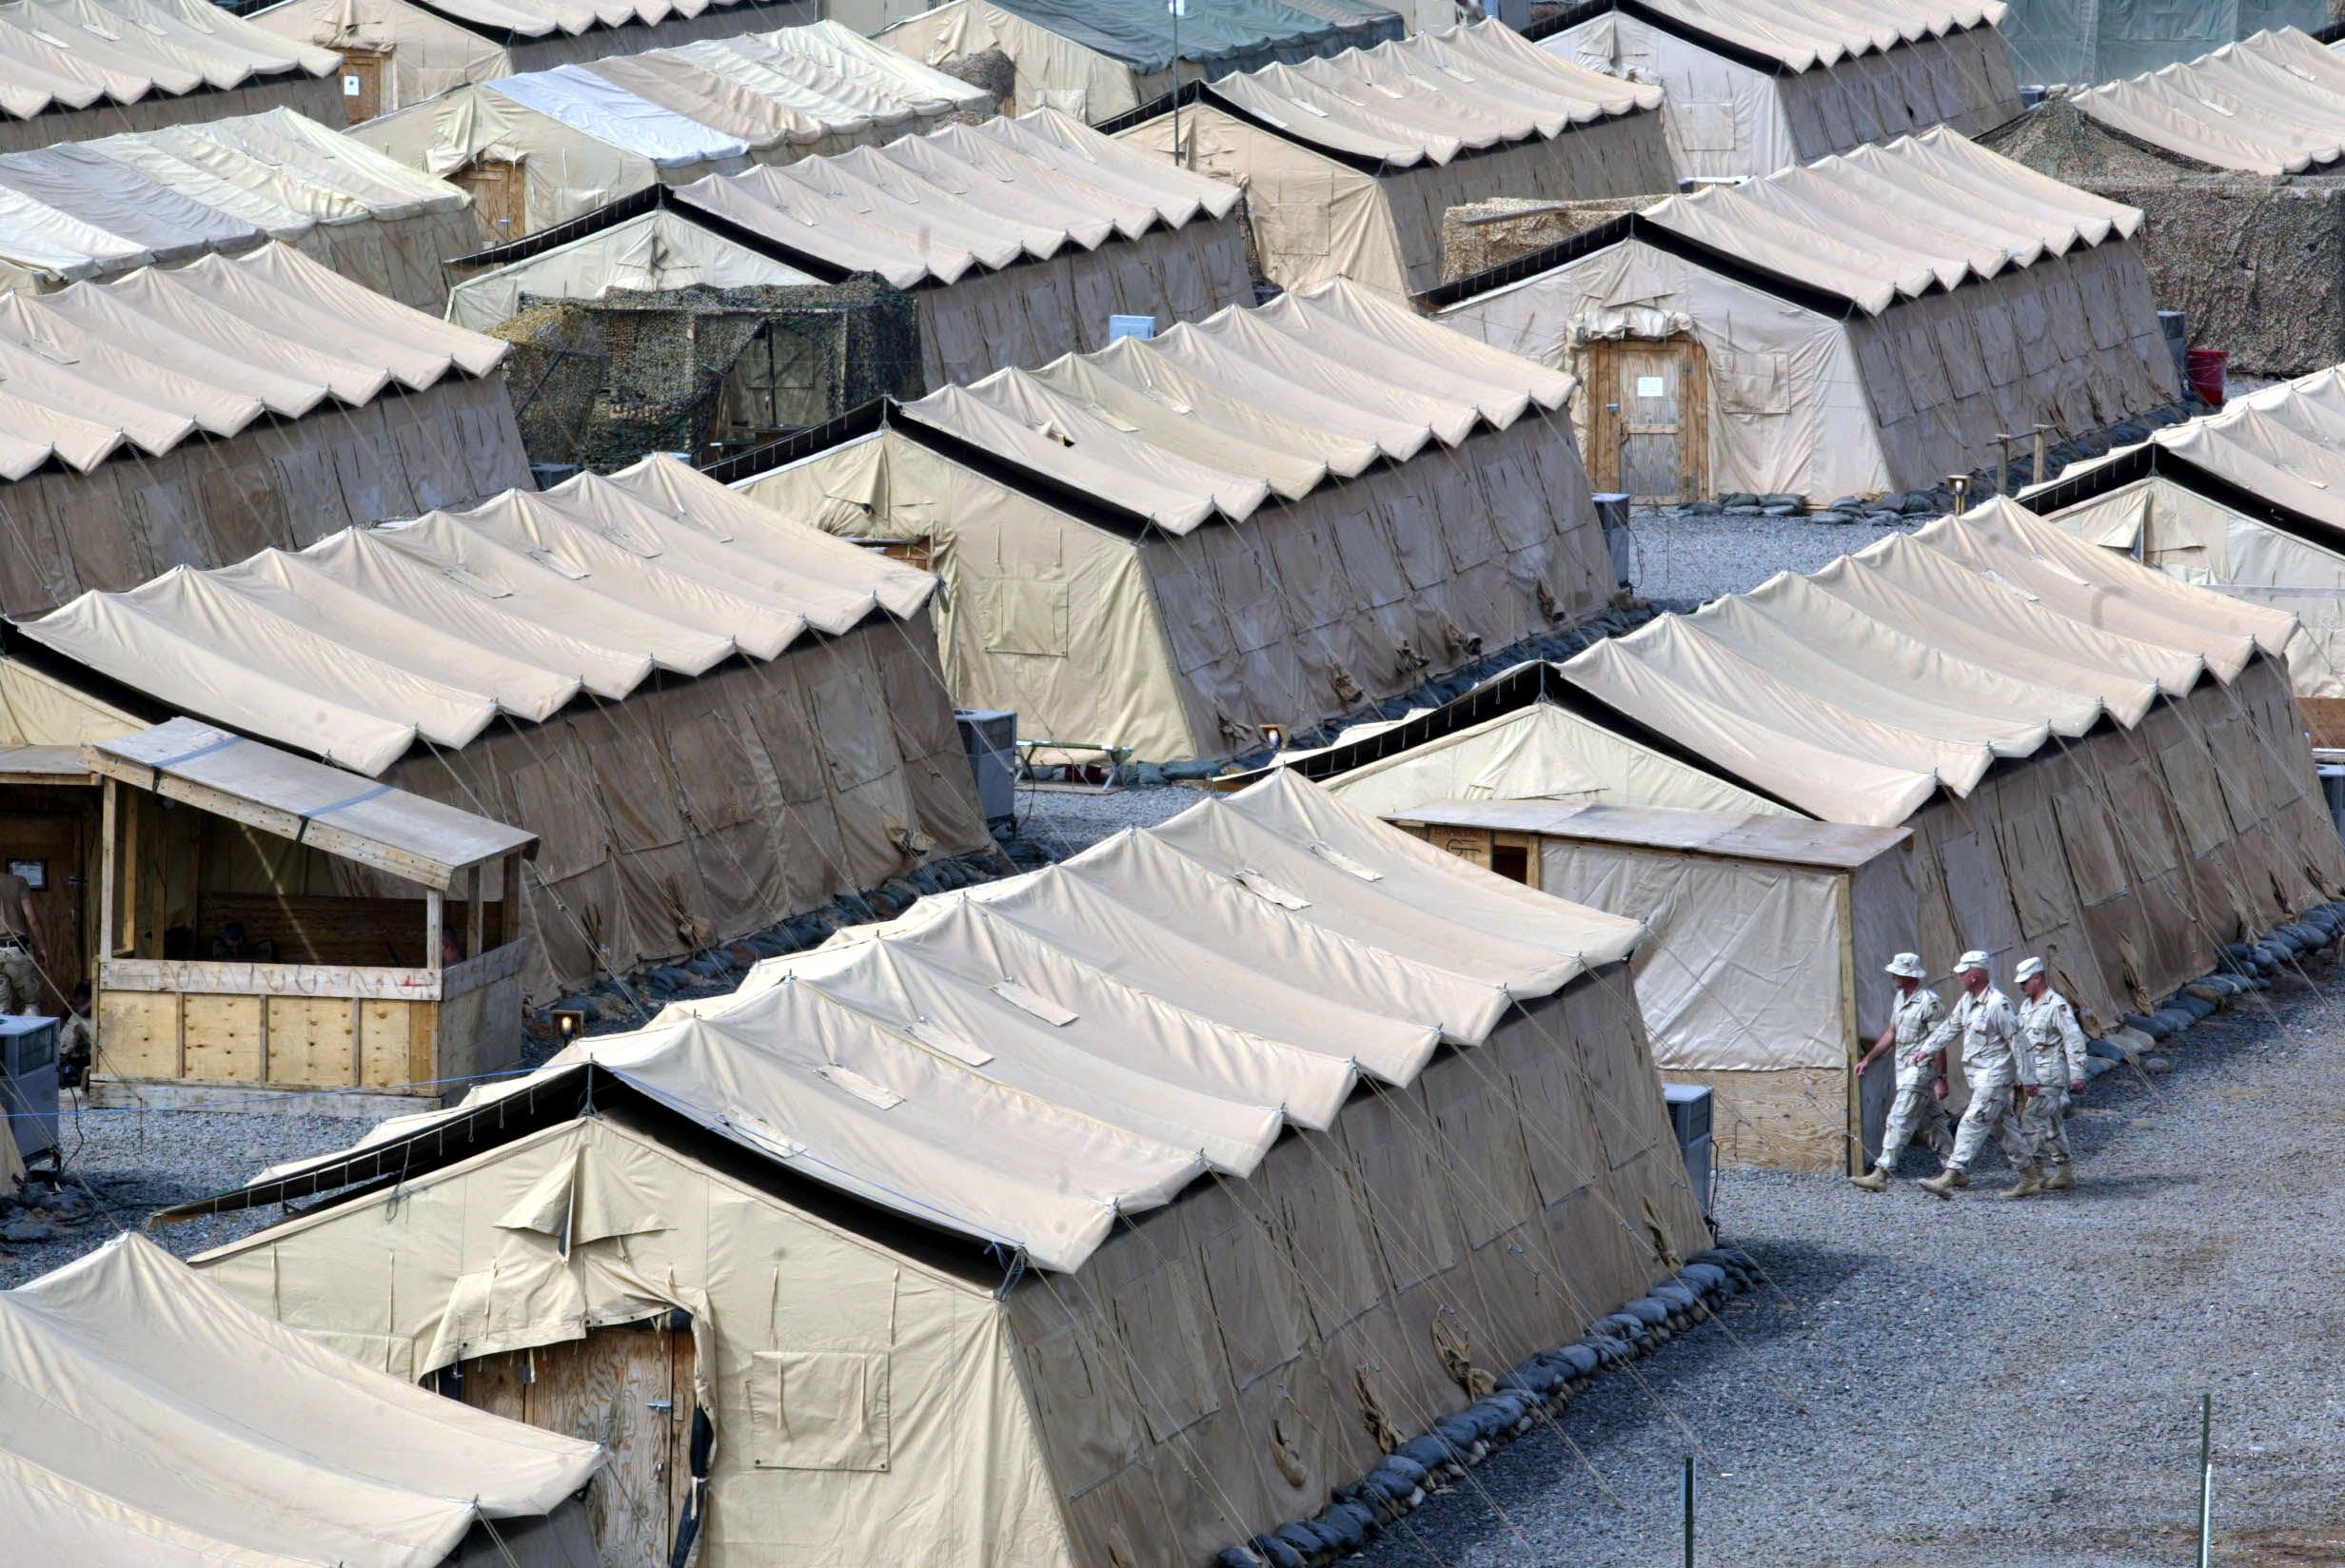 War on Terror, Camp Lemonier, Djibouti